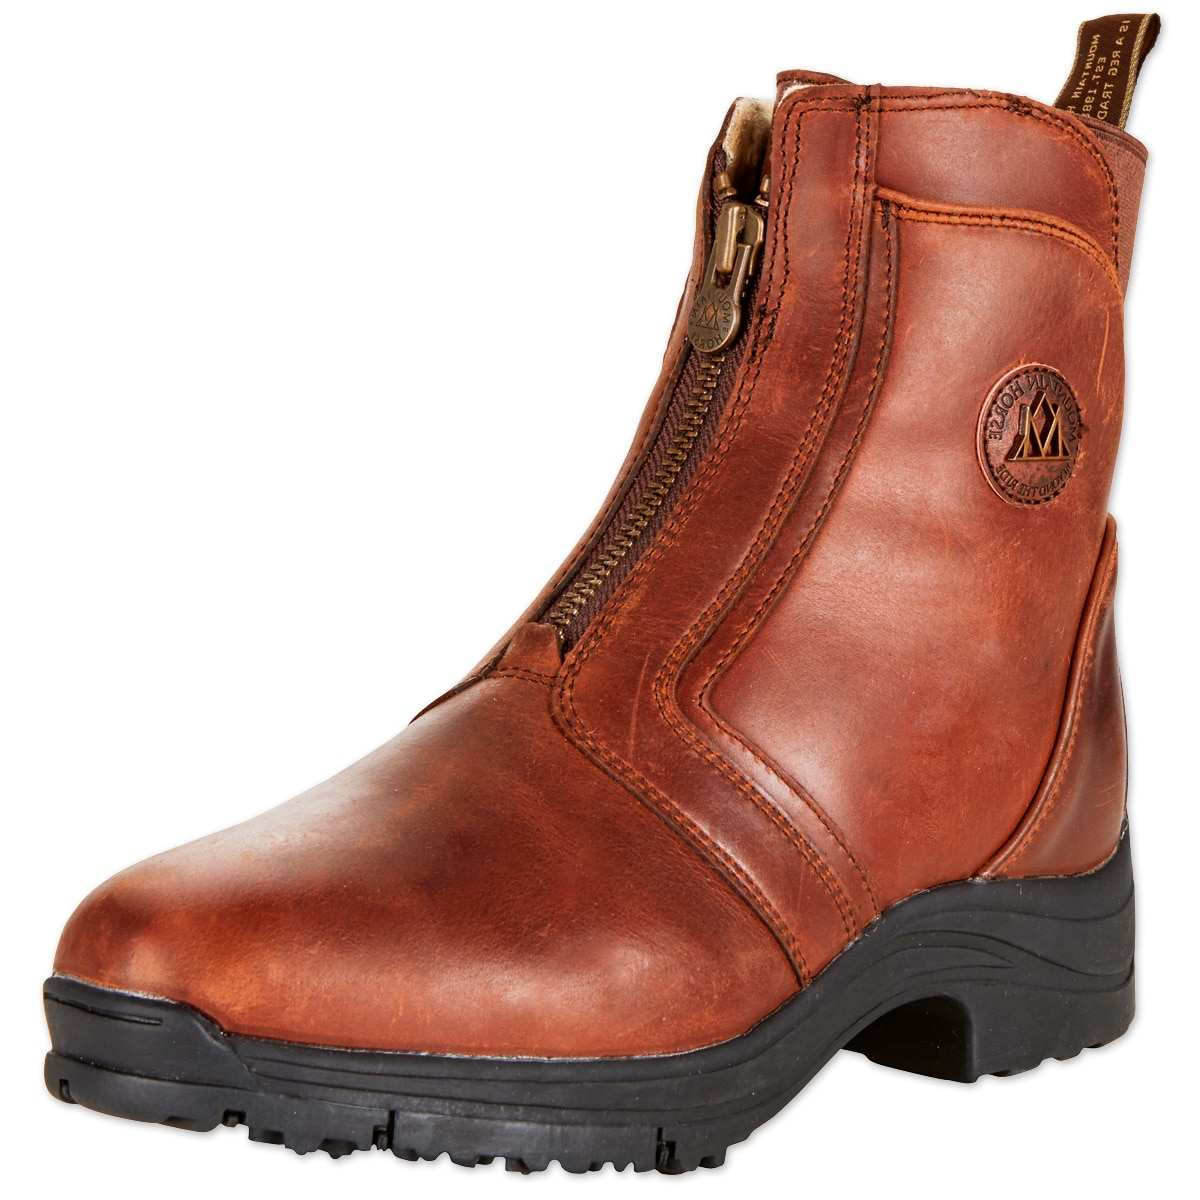 8ea331f00f57 Mountain Horse Snowy River Zip Paddock Boot